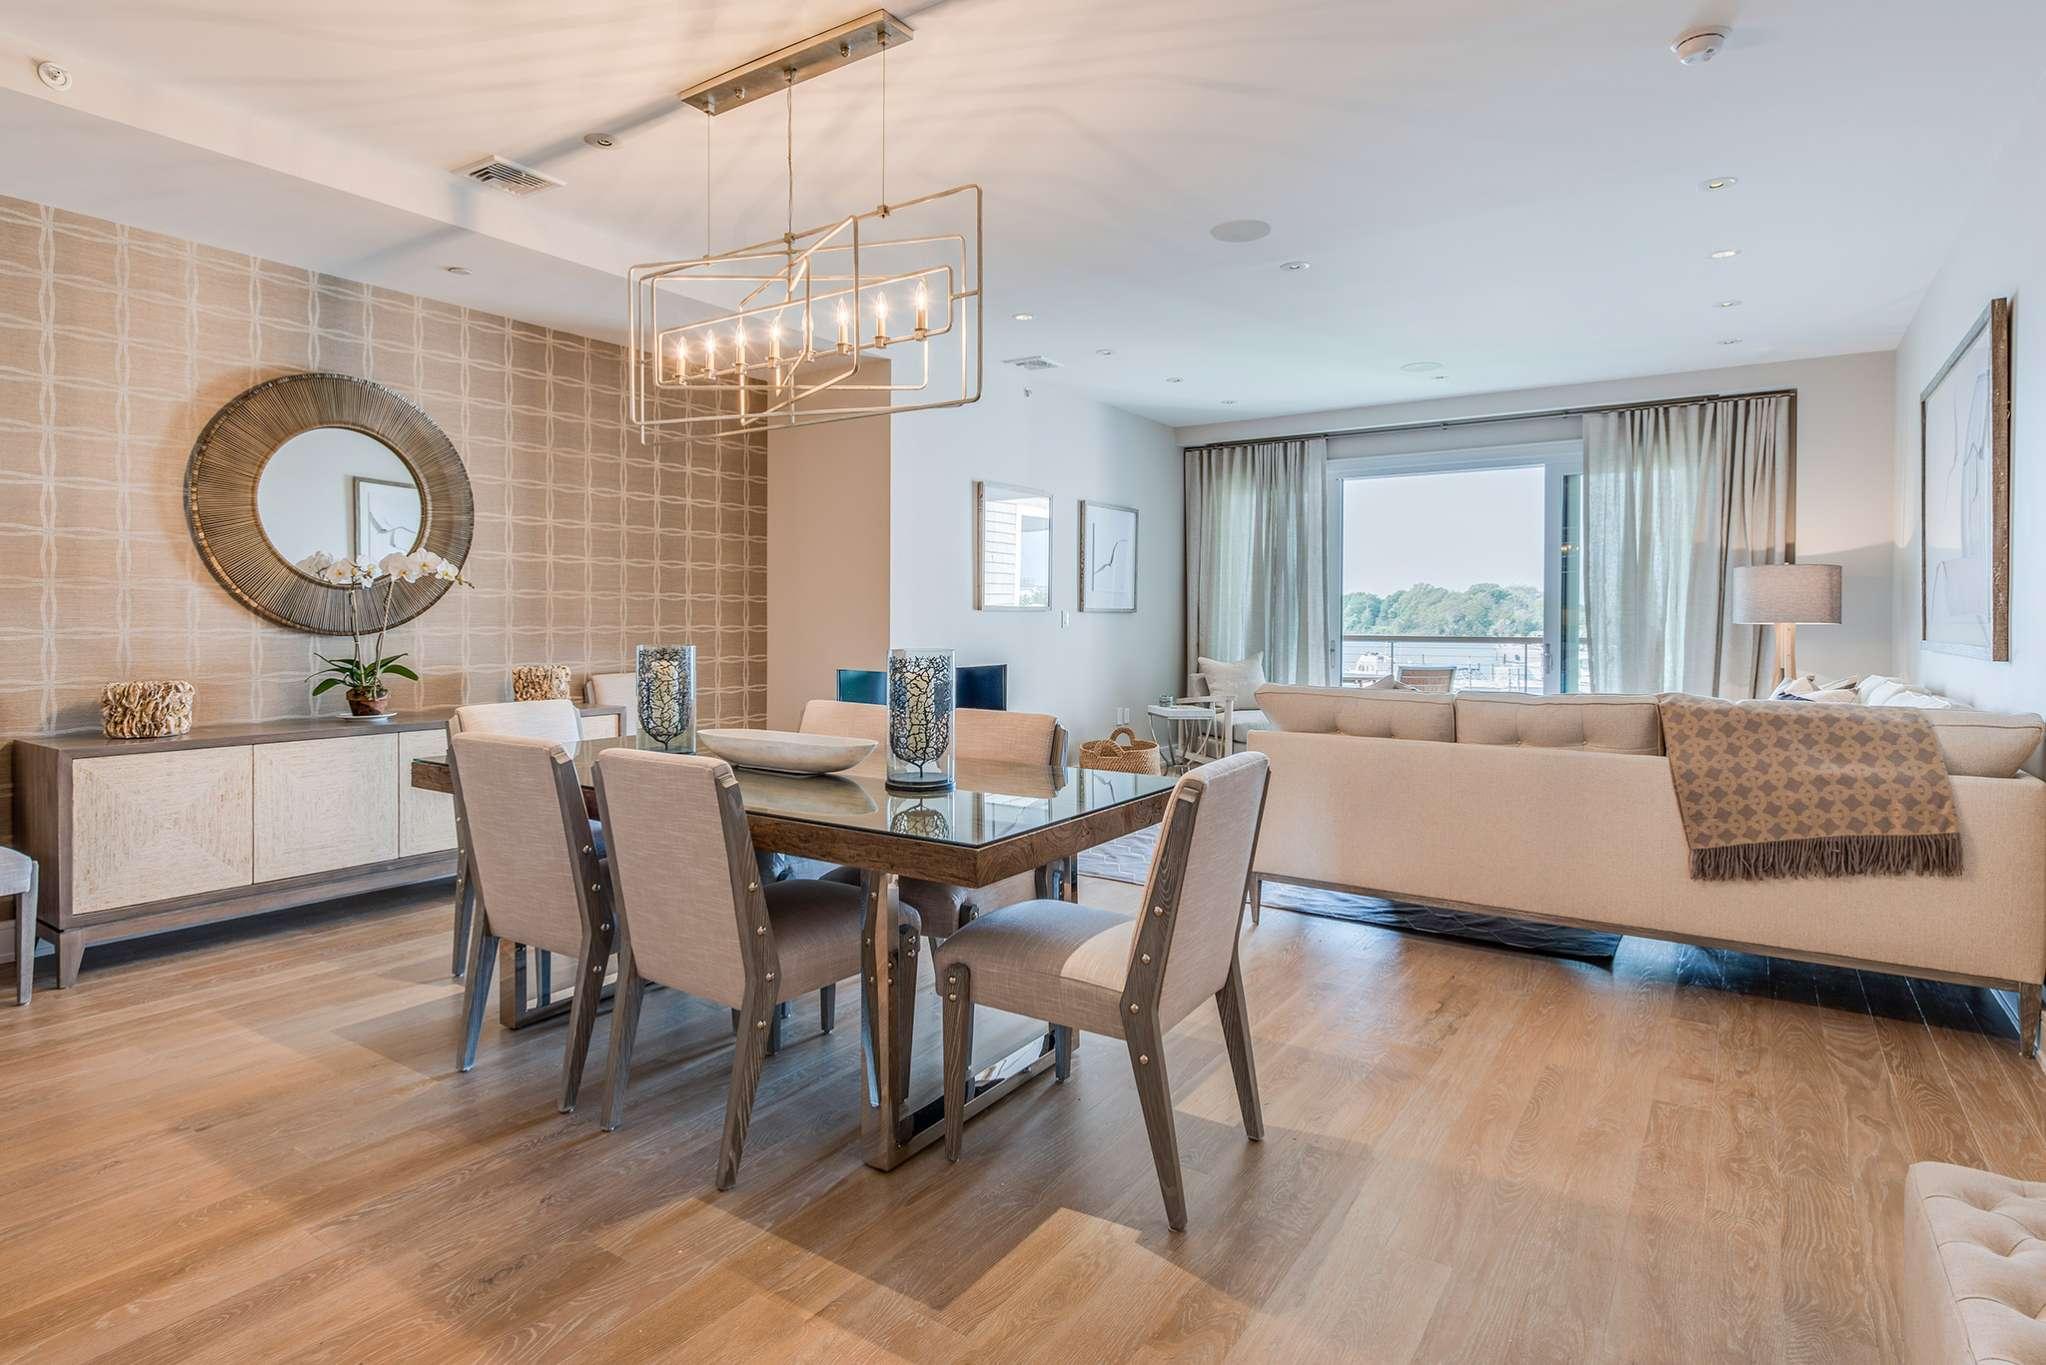 Condominium for Sale at Harbor's Edge - Resort Lifestyle In Sag Harbor 21 West Water Street, 2c, Sag Harbor, New York